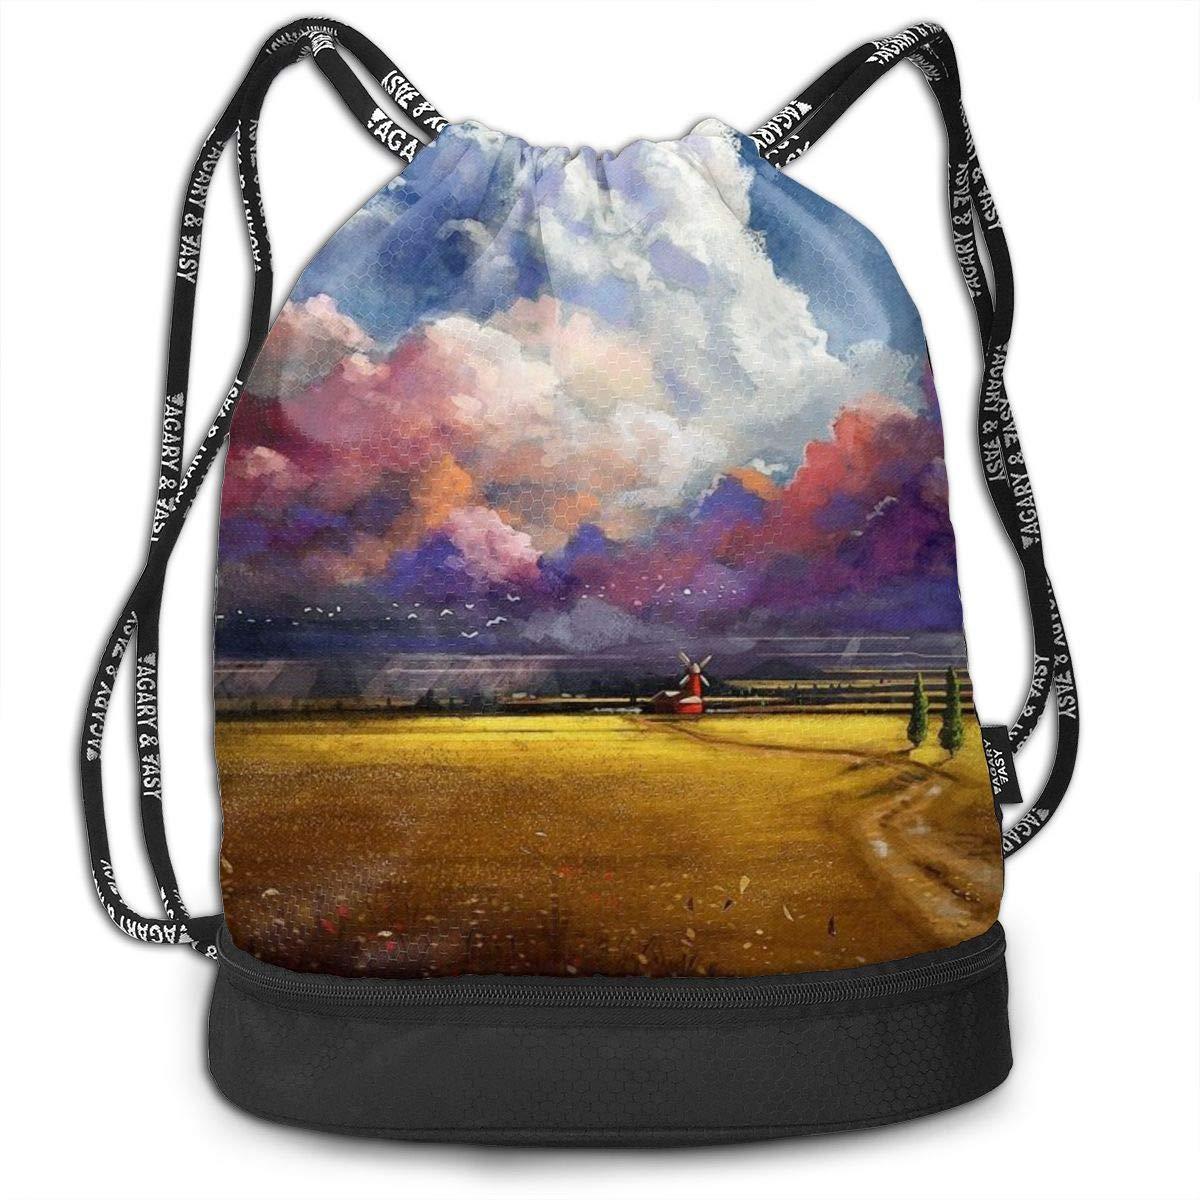 Windmill Sunshine Day Printed Sackpack Women Kji Gym Sack Drawstring Bag Sport Cinch Pack Backpack for Men